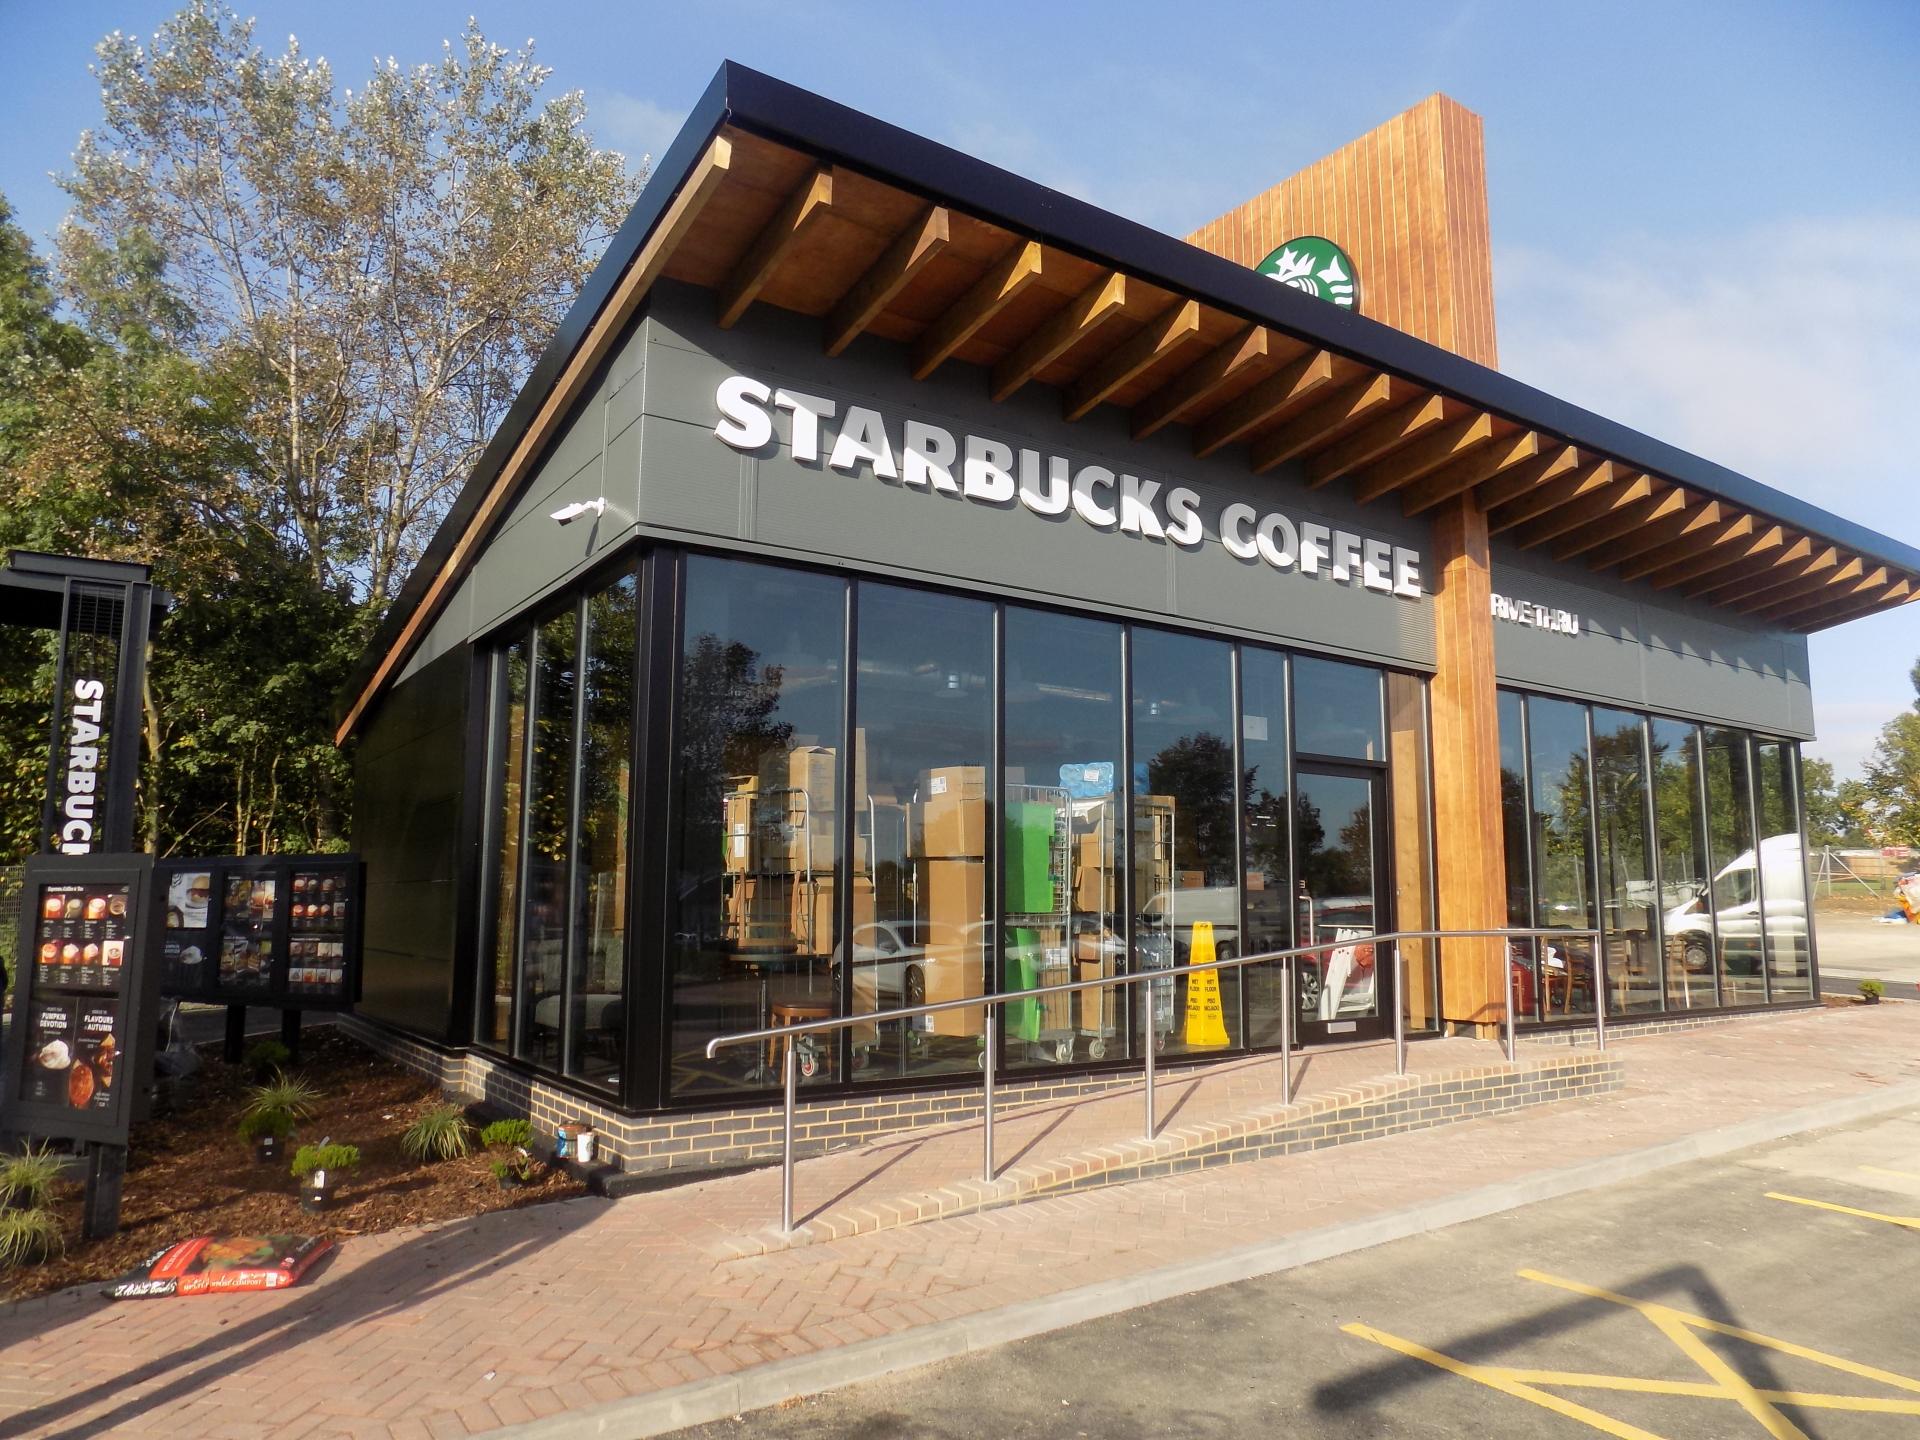 Starbucks South Mimms